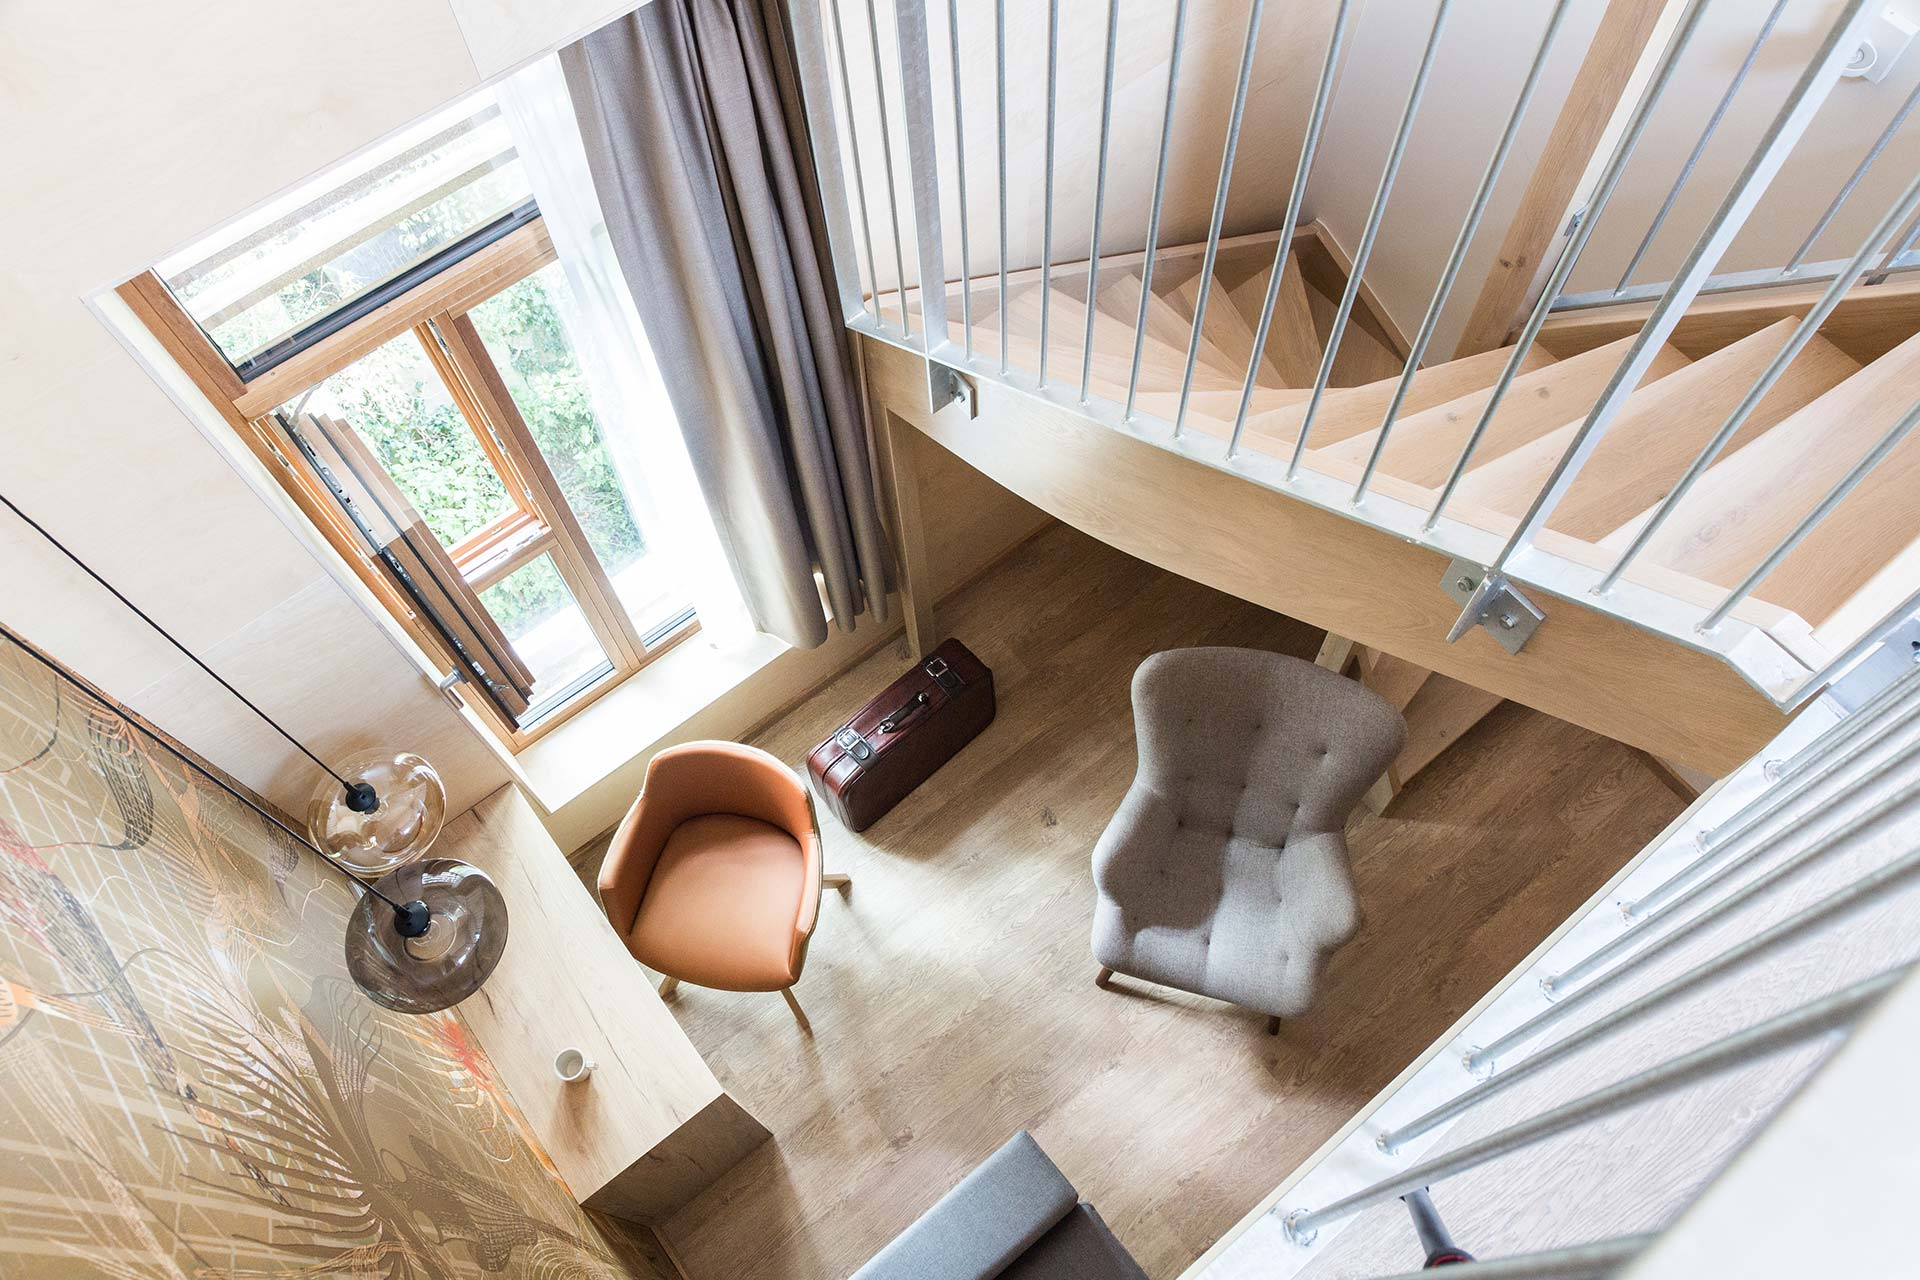 landgoed hotel hotelkamer entresol dubbel bank trap licht geel hout duurzaam fris nieuw vught